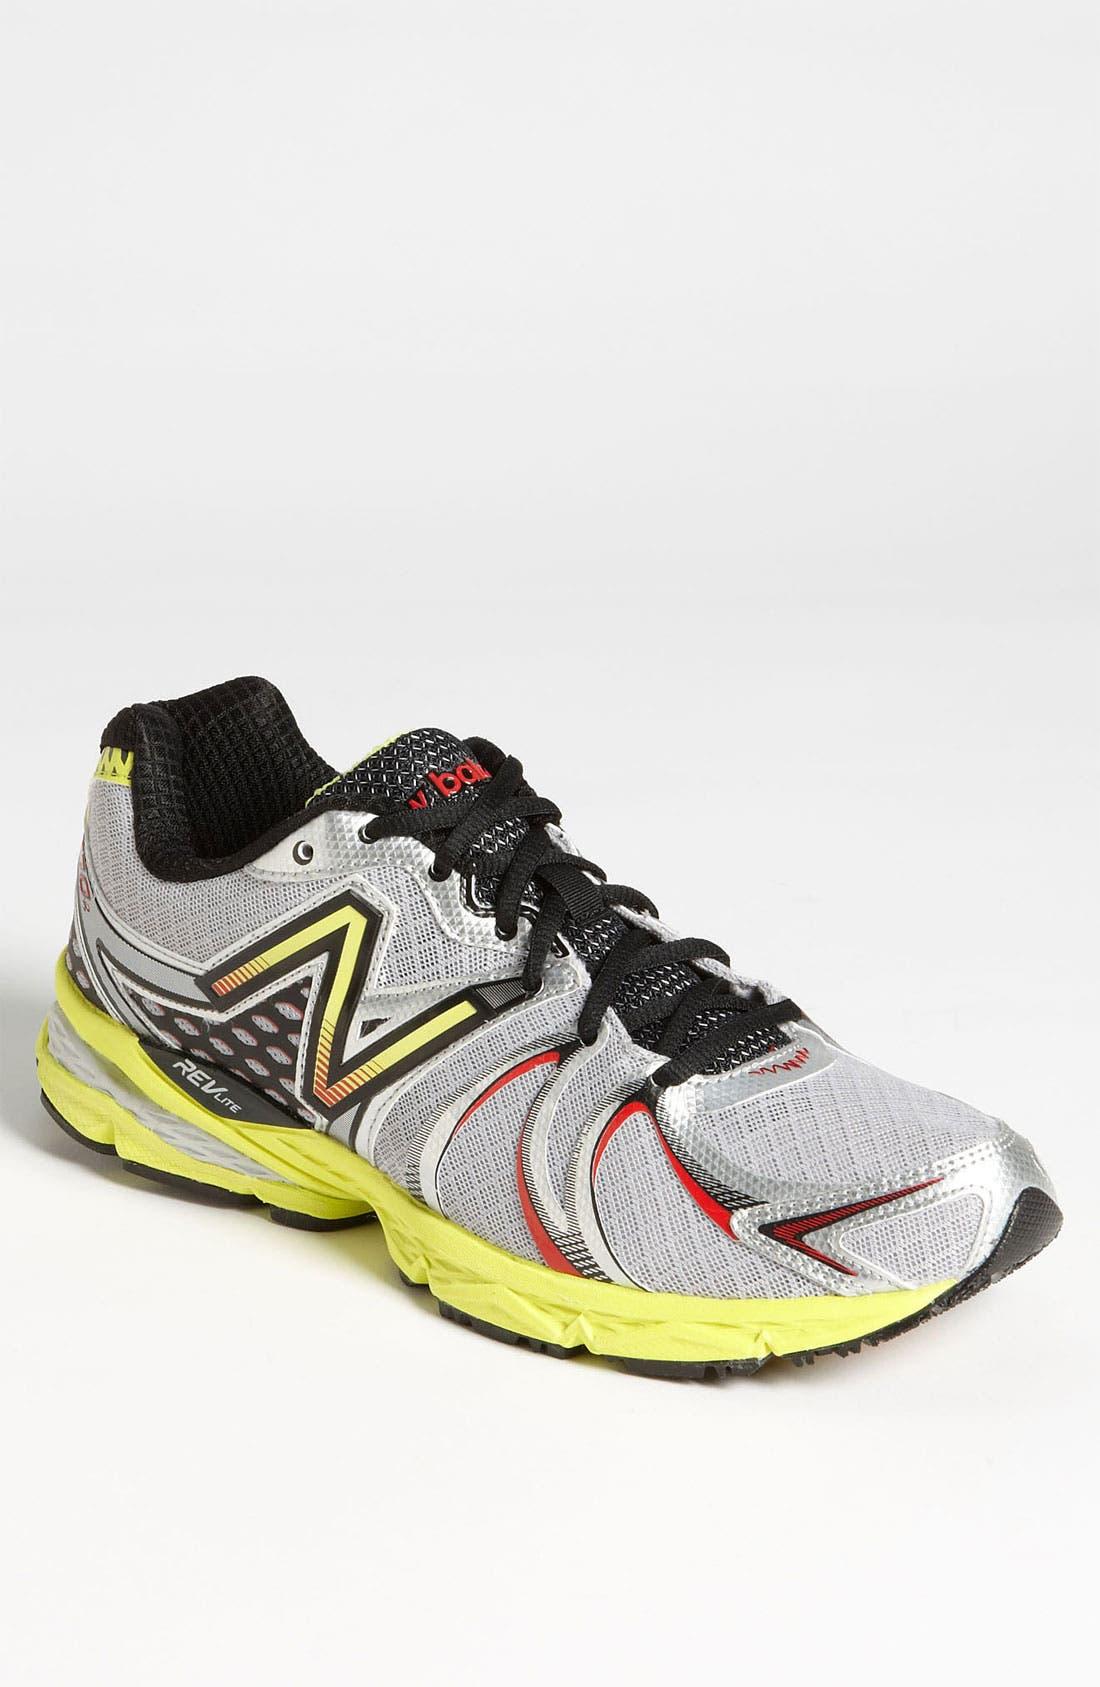 Alternate Image 1 Selected - New Balance '870' Running Shoe (Men)